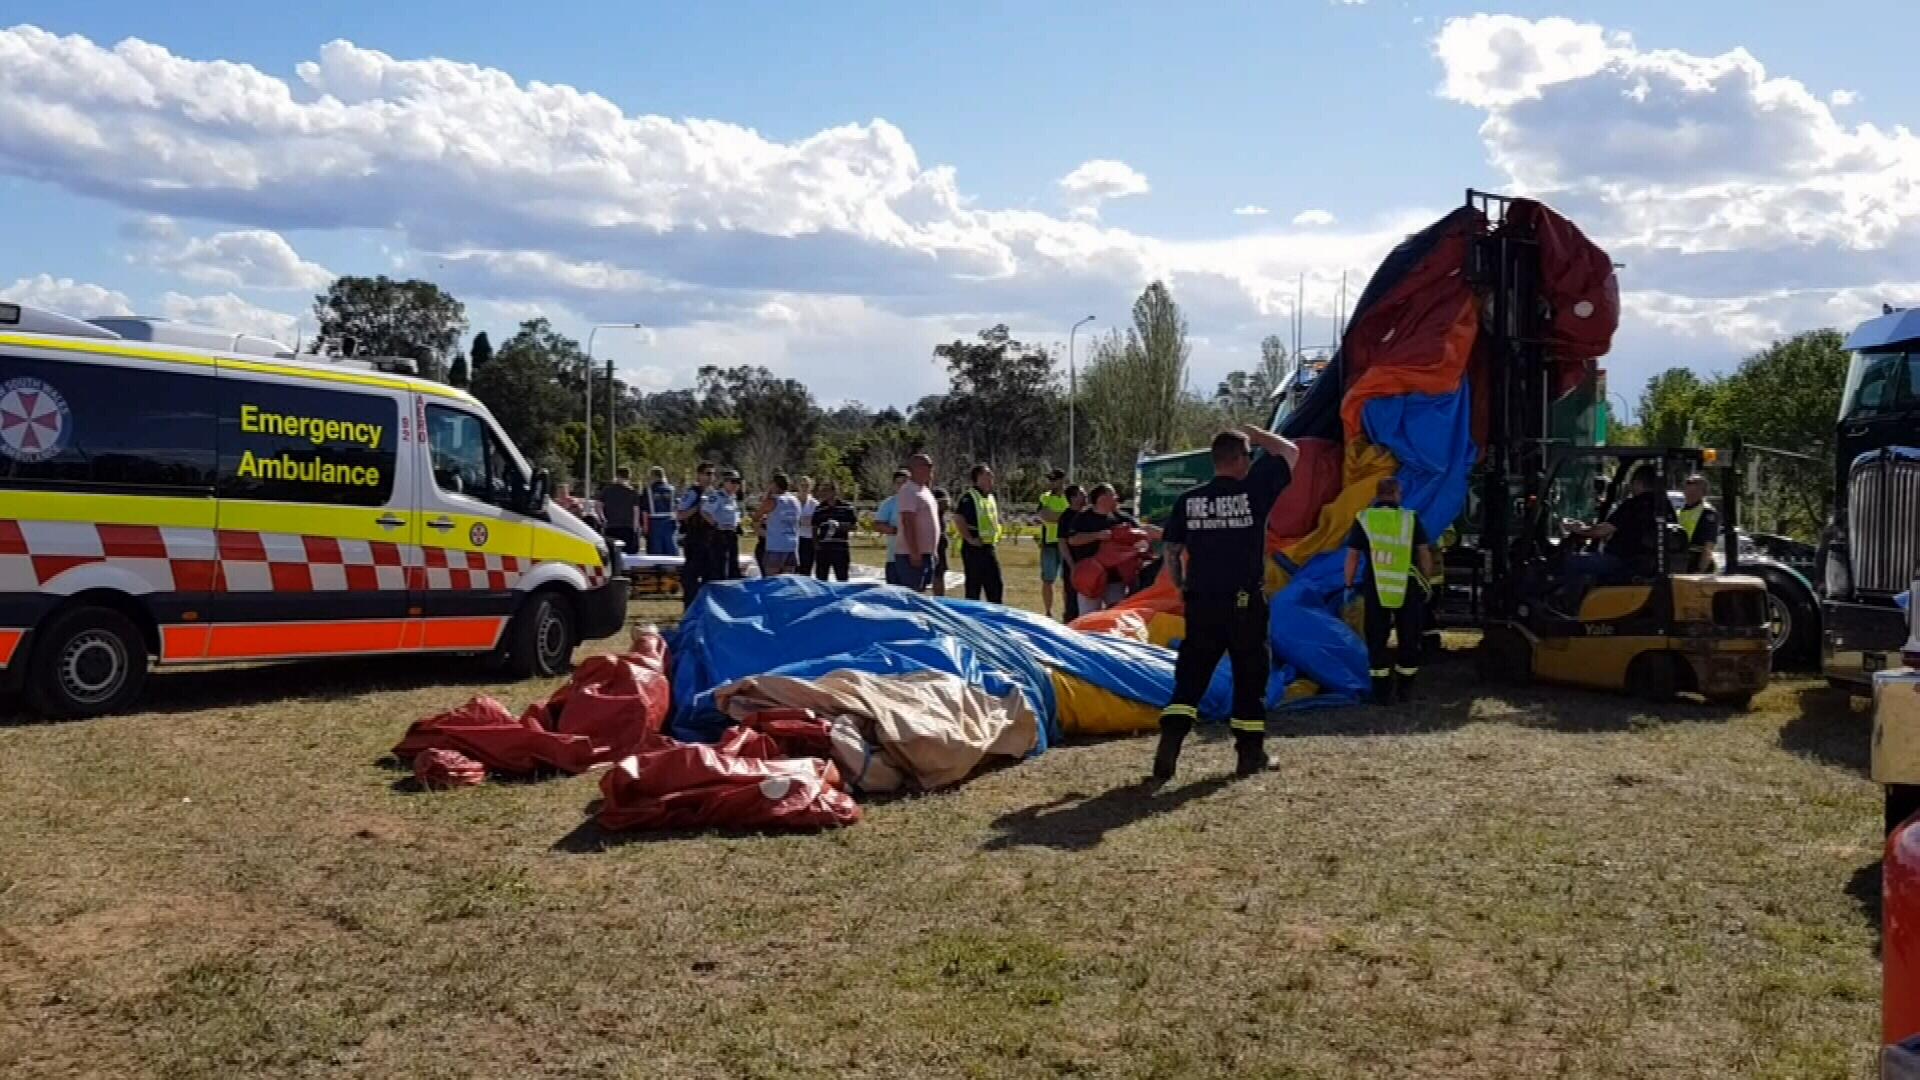 Children injured as strong winds flip jumping castle